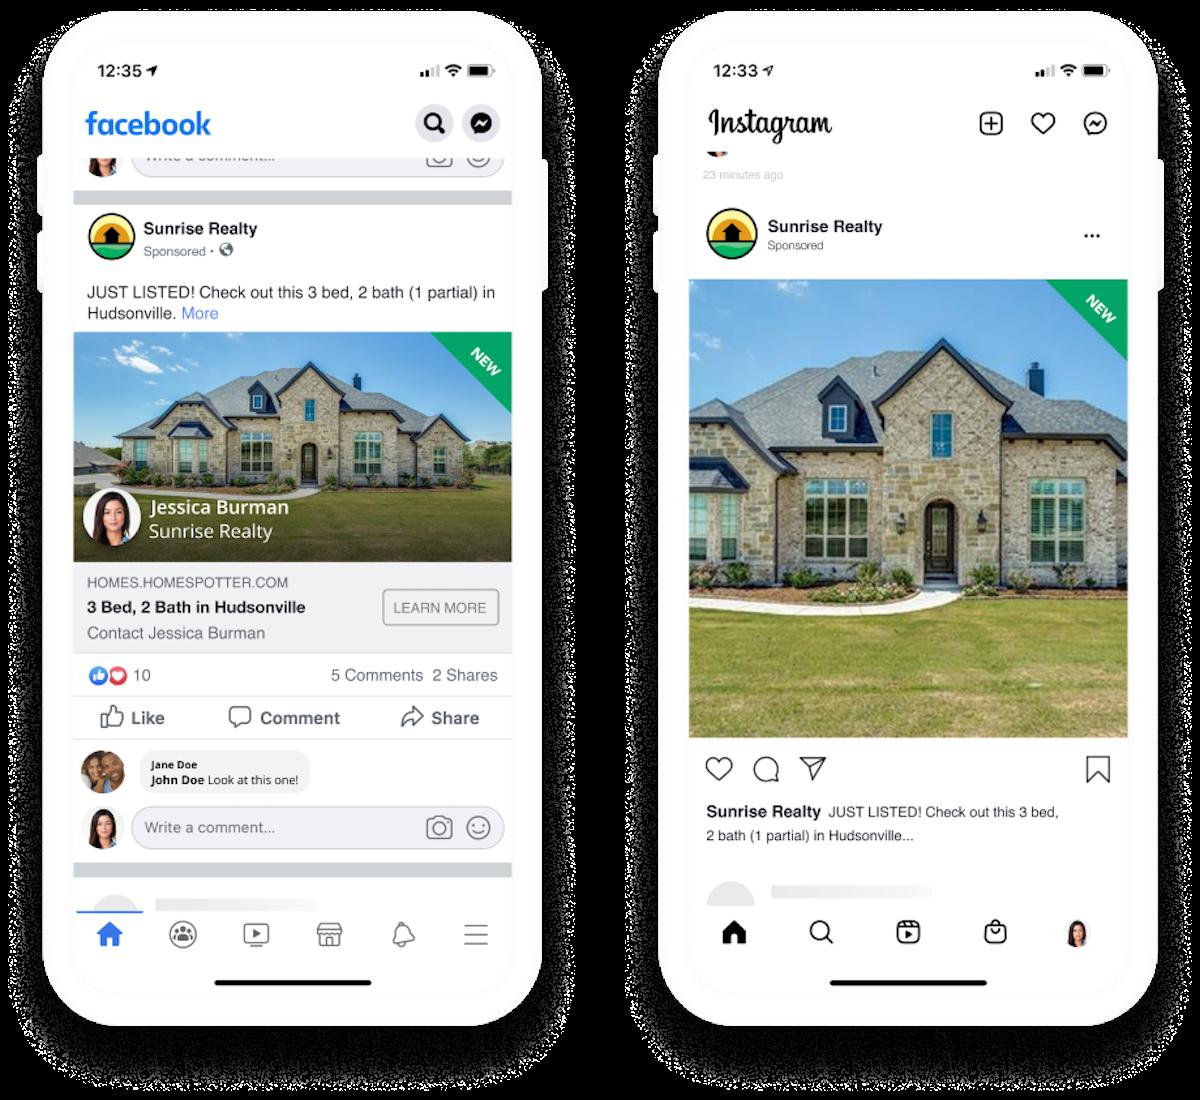 Facebook and Instagram ads displayed on phones